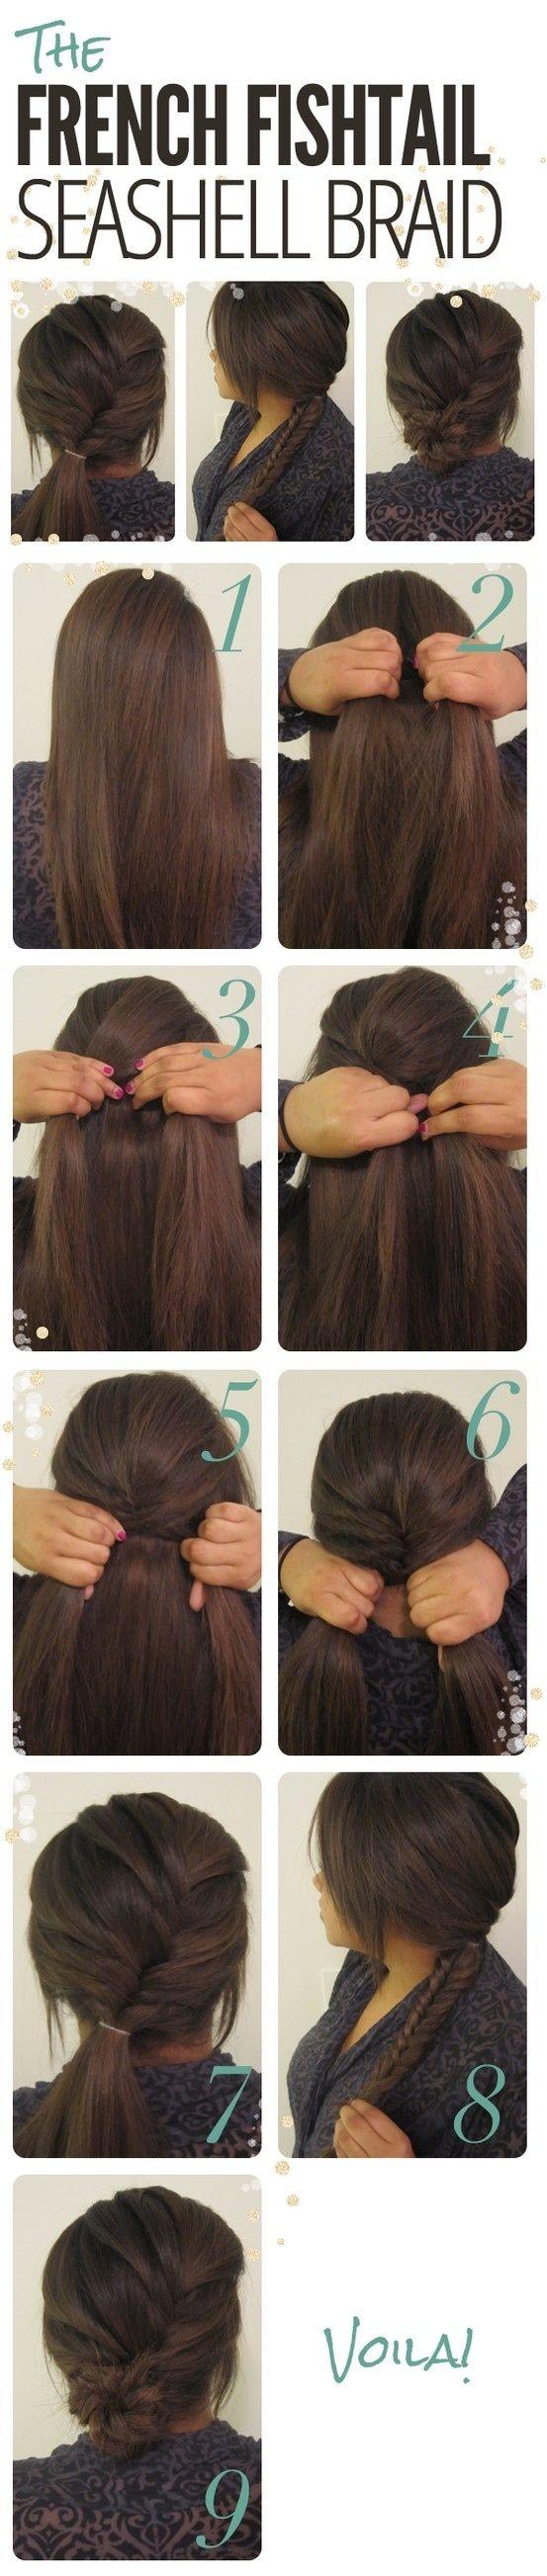 Tremendous My Hair Fishtail And Tutorials On Pinterest Short Hairstyles Gunalazisus